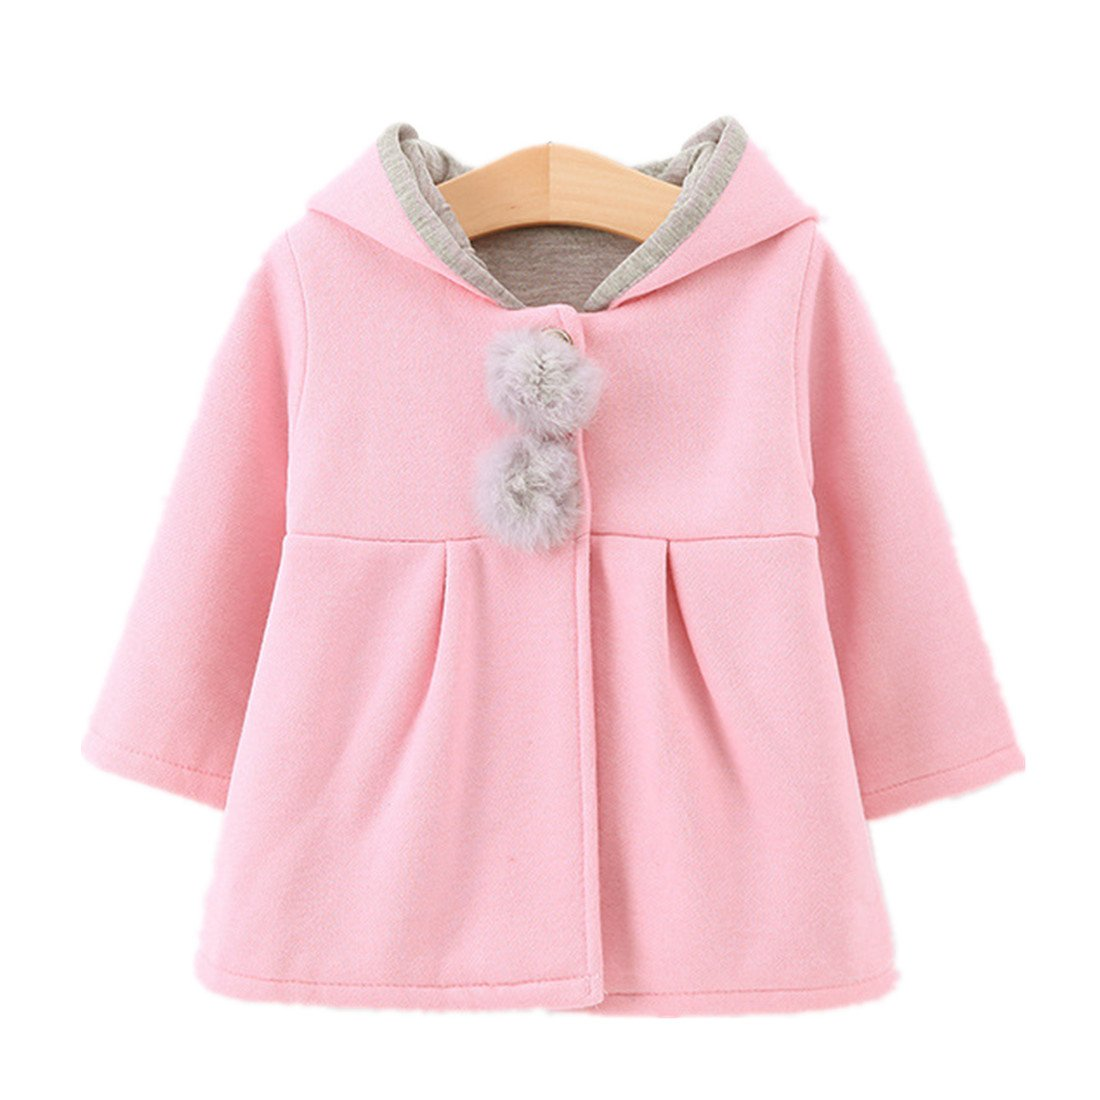 Zerowin Baby Girls Toddler Kids Winter Big Ears Hoodie Jackets Outerwear Coats (10/18-24 months, Pink)